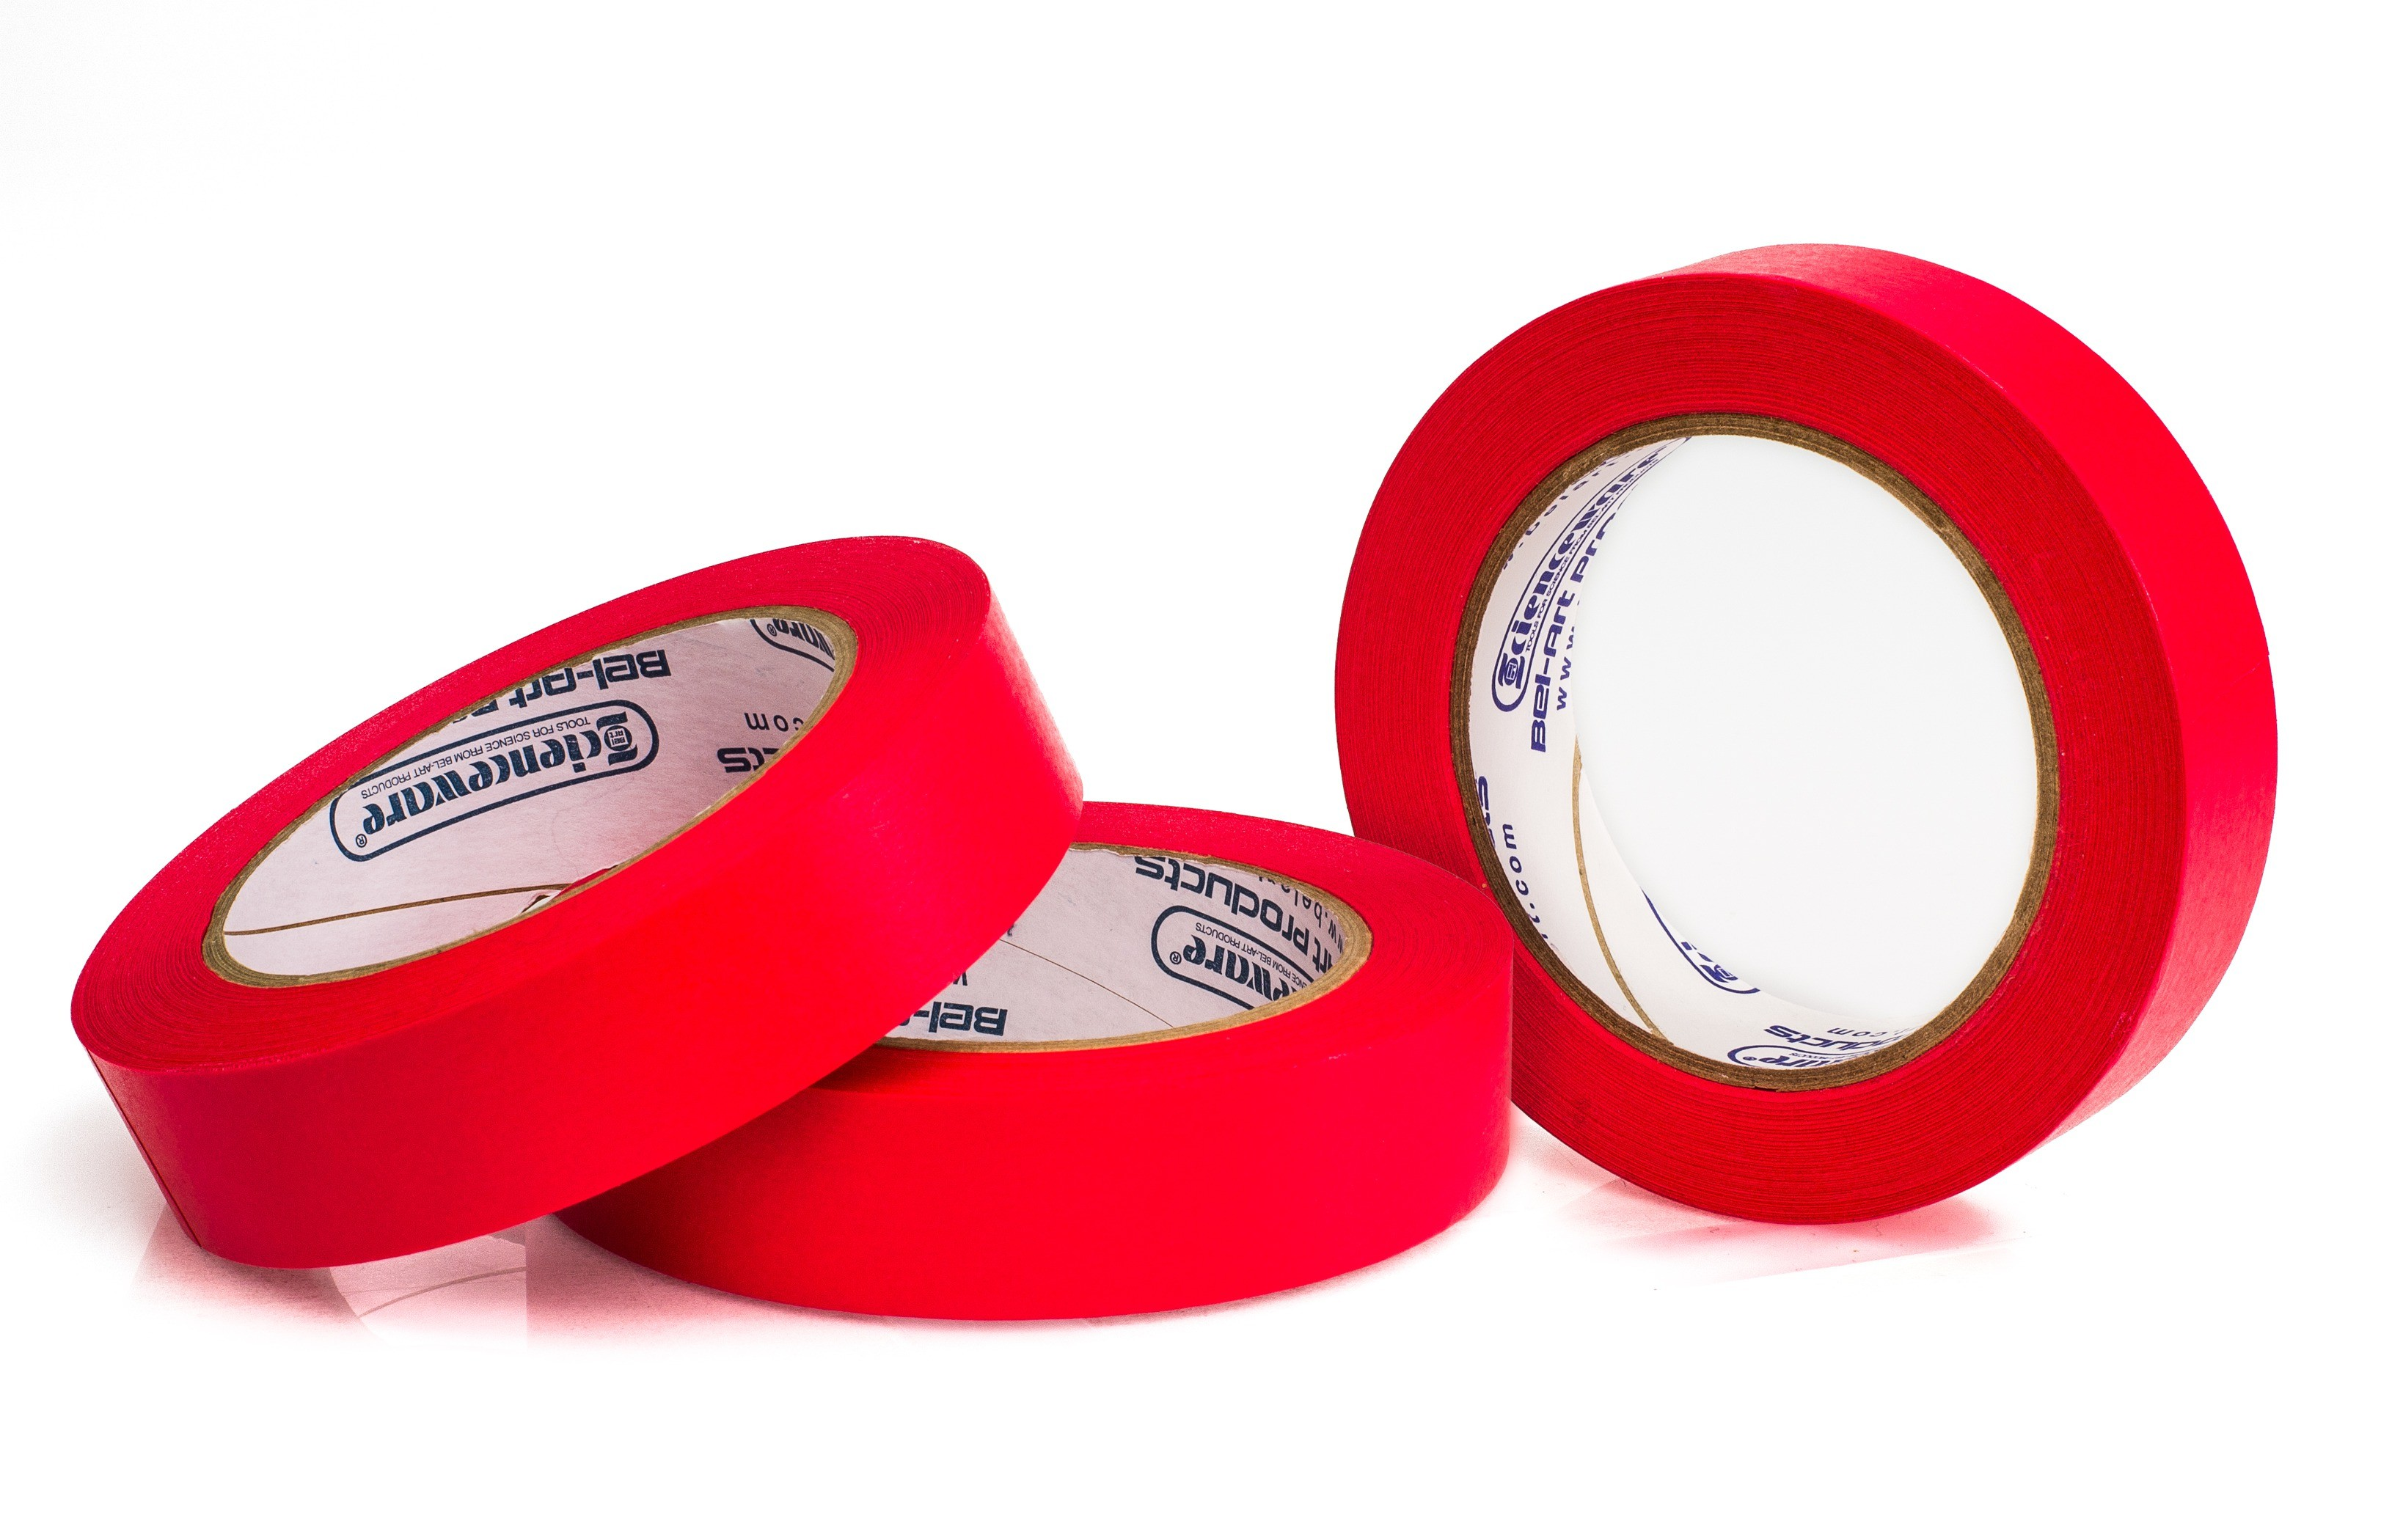 SP Bel-Art Write-On Red Label Tape; 40yd Length, 1 in. Width, 3 in. Core (Pack of 3)